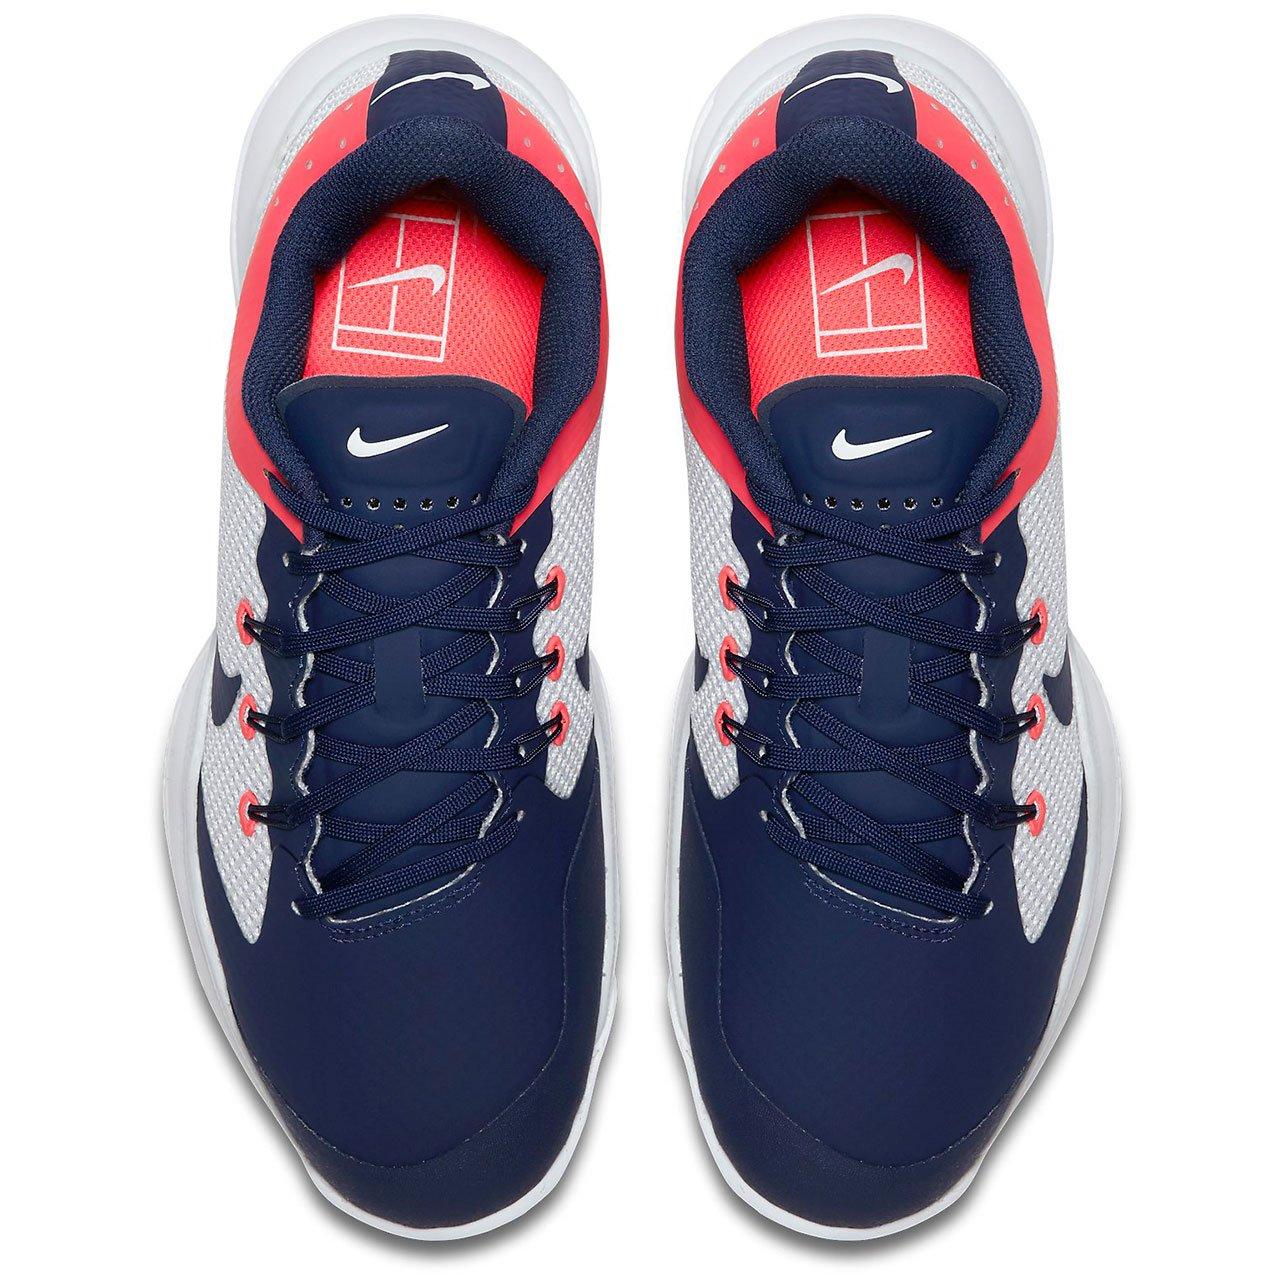 Nike Women's Air Zoom Ultra Tennis Shoes (7.5)